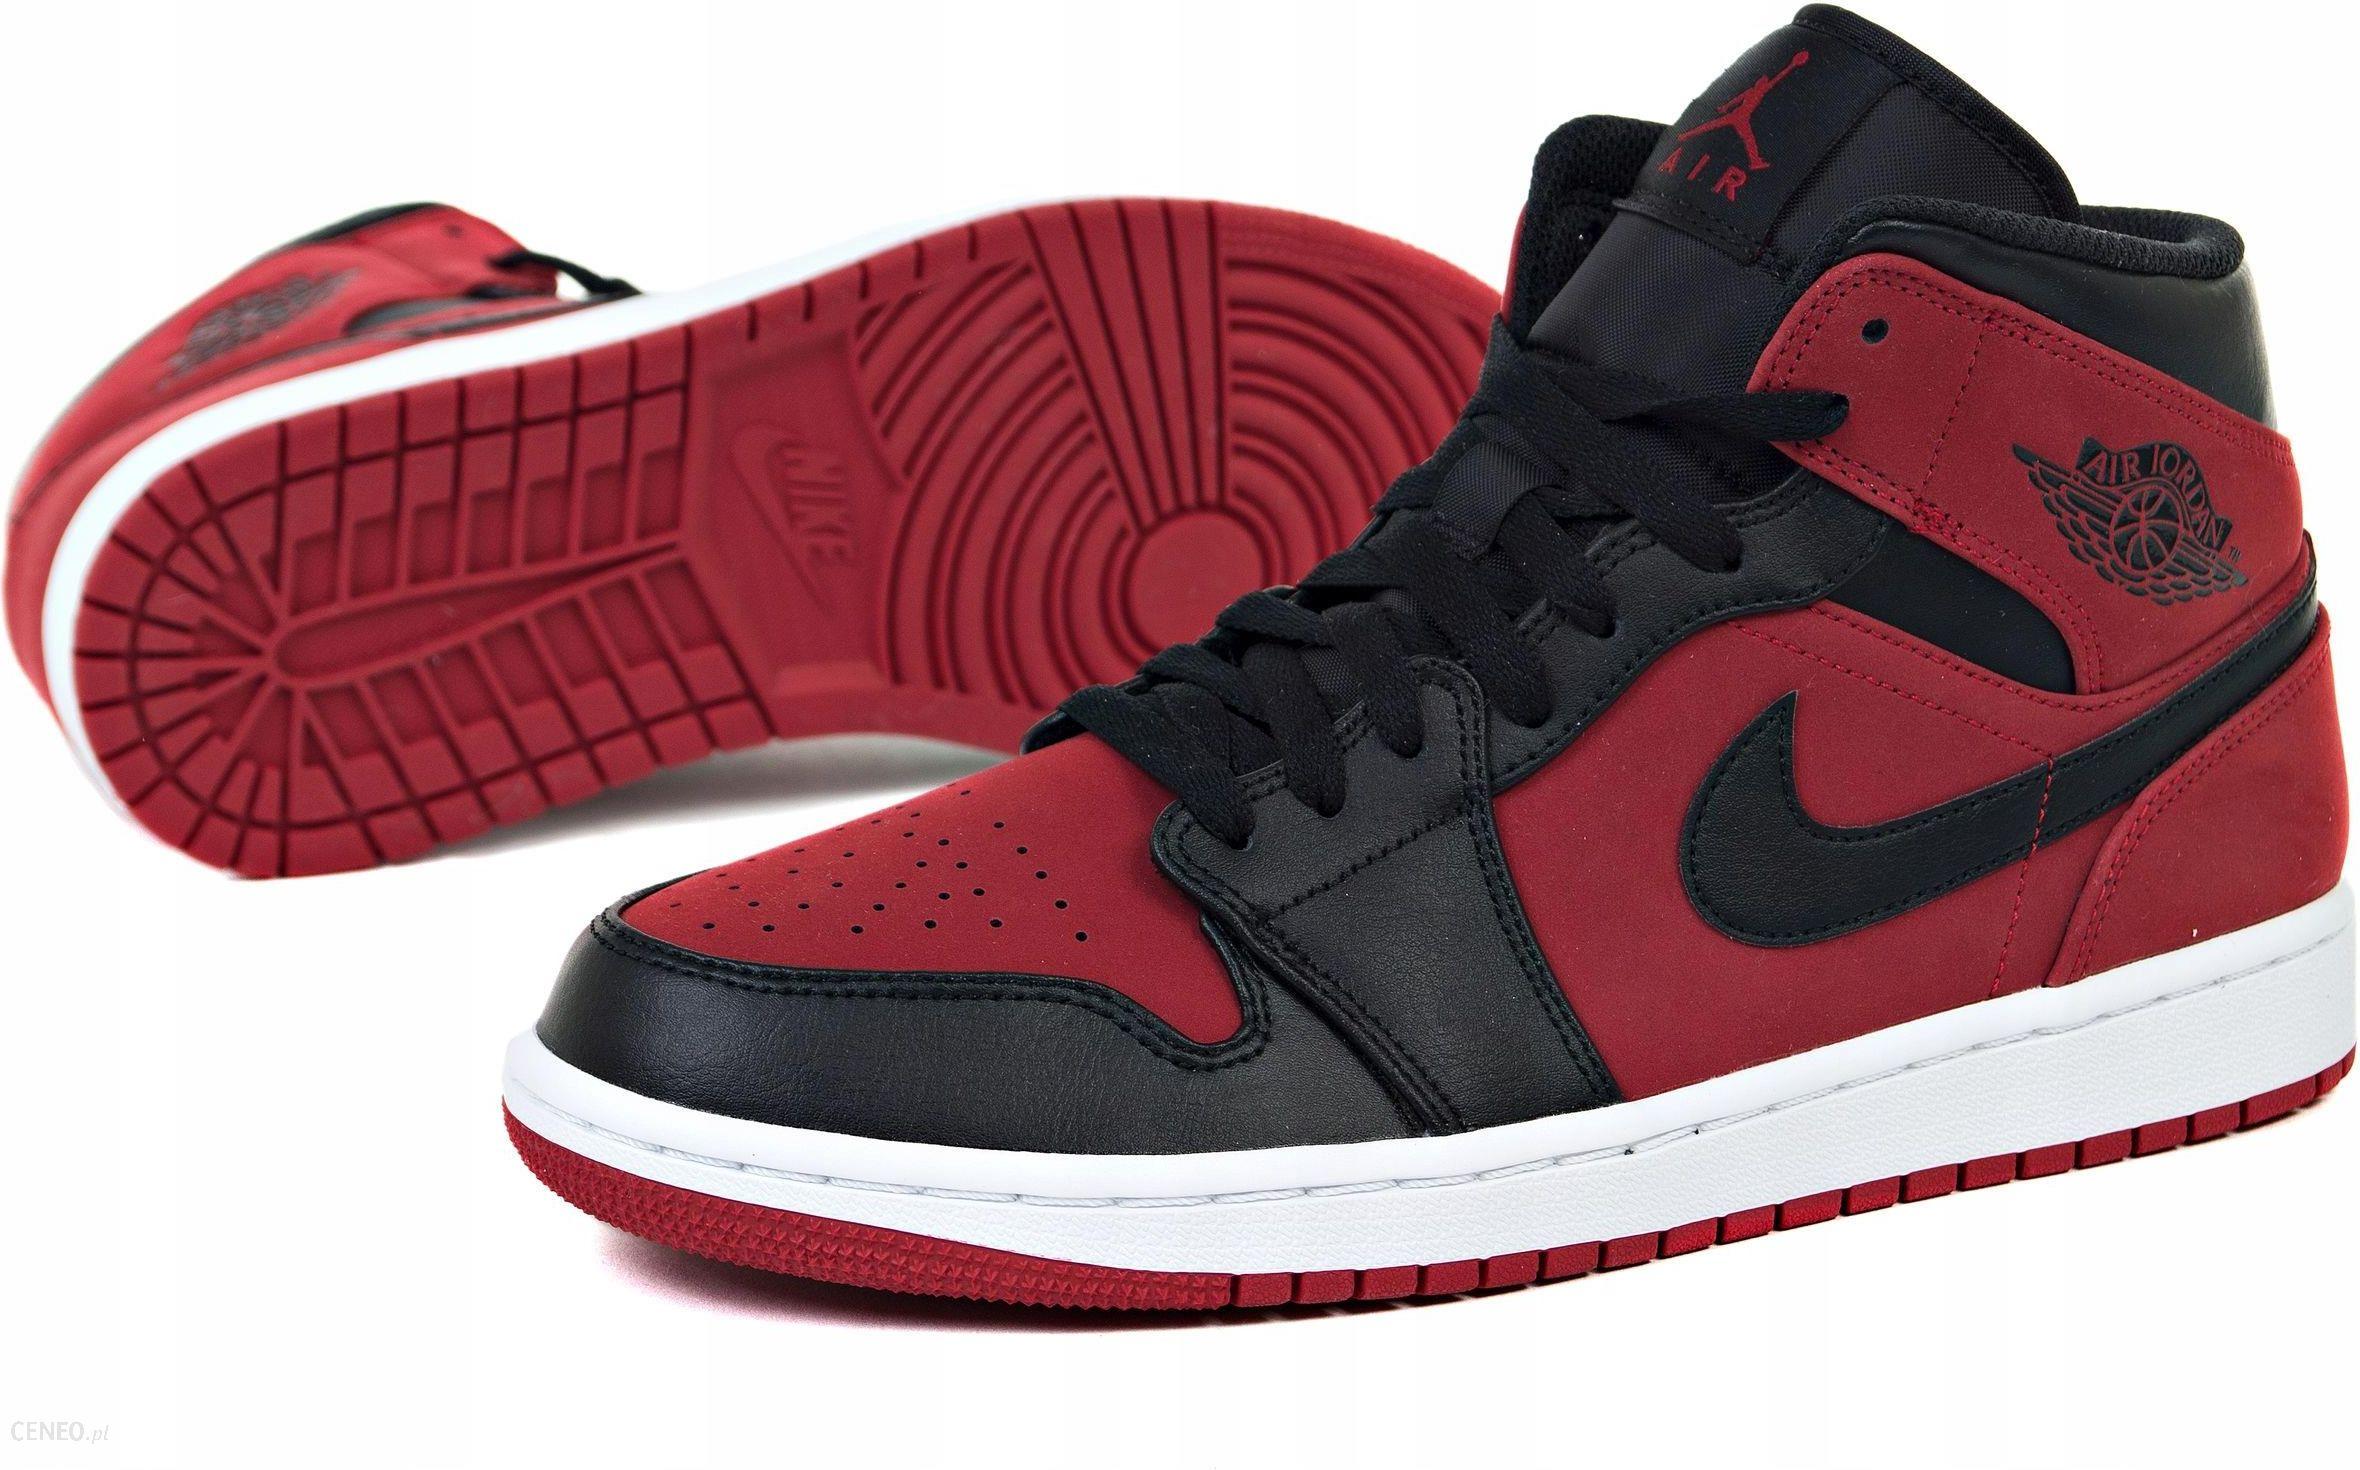 Buty Nike Air Jordan 1 MID 554724 610 R. 45 Ceny i opinie Ceneo.pl